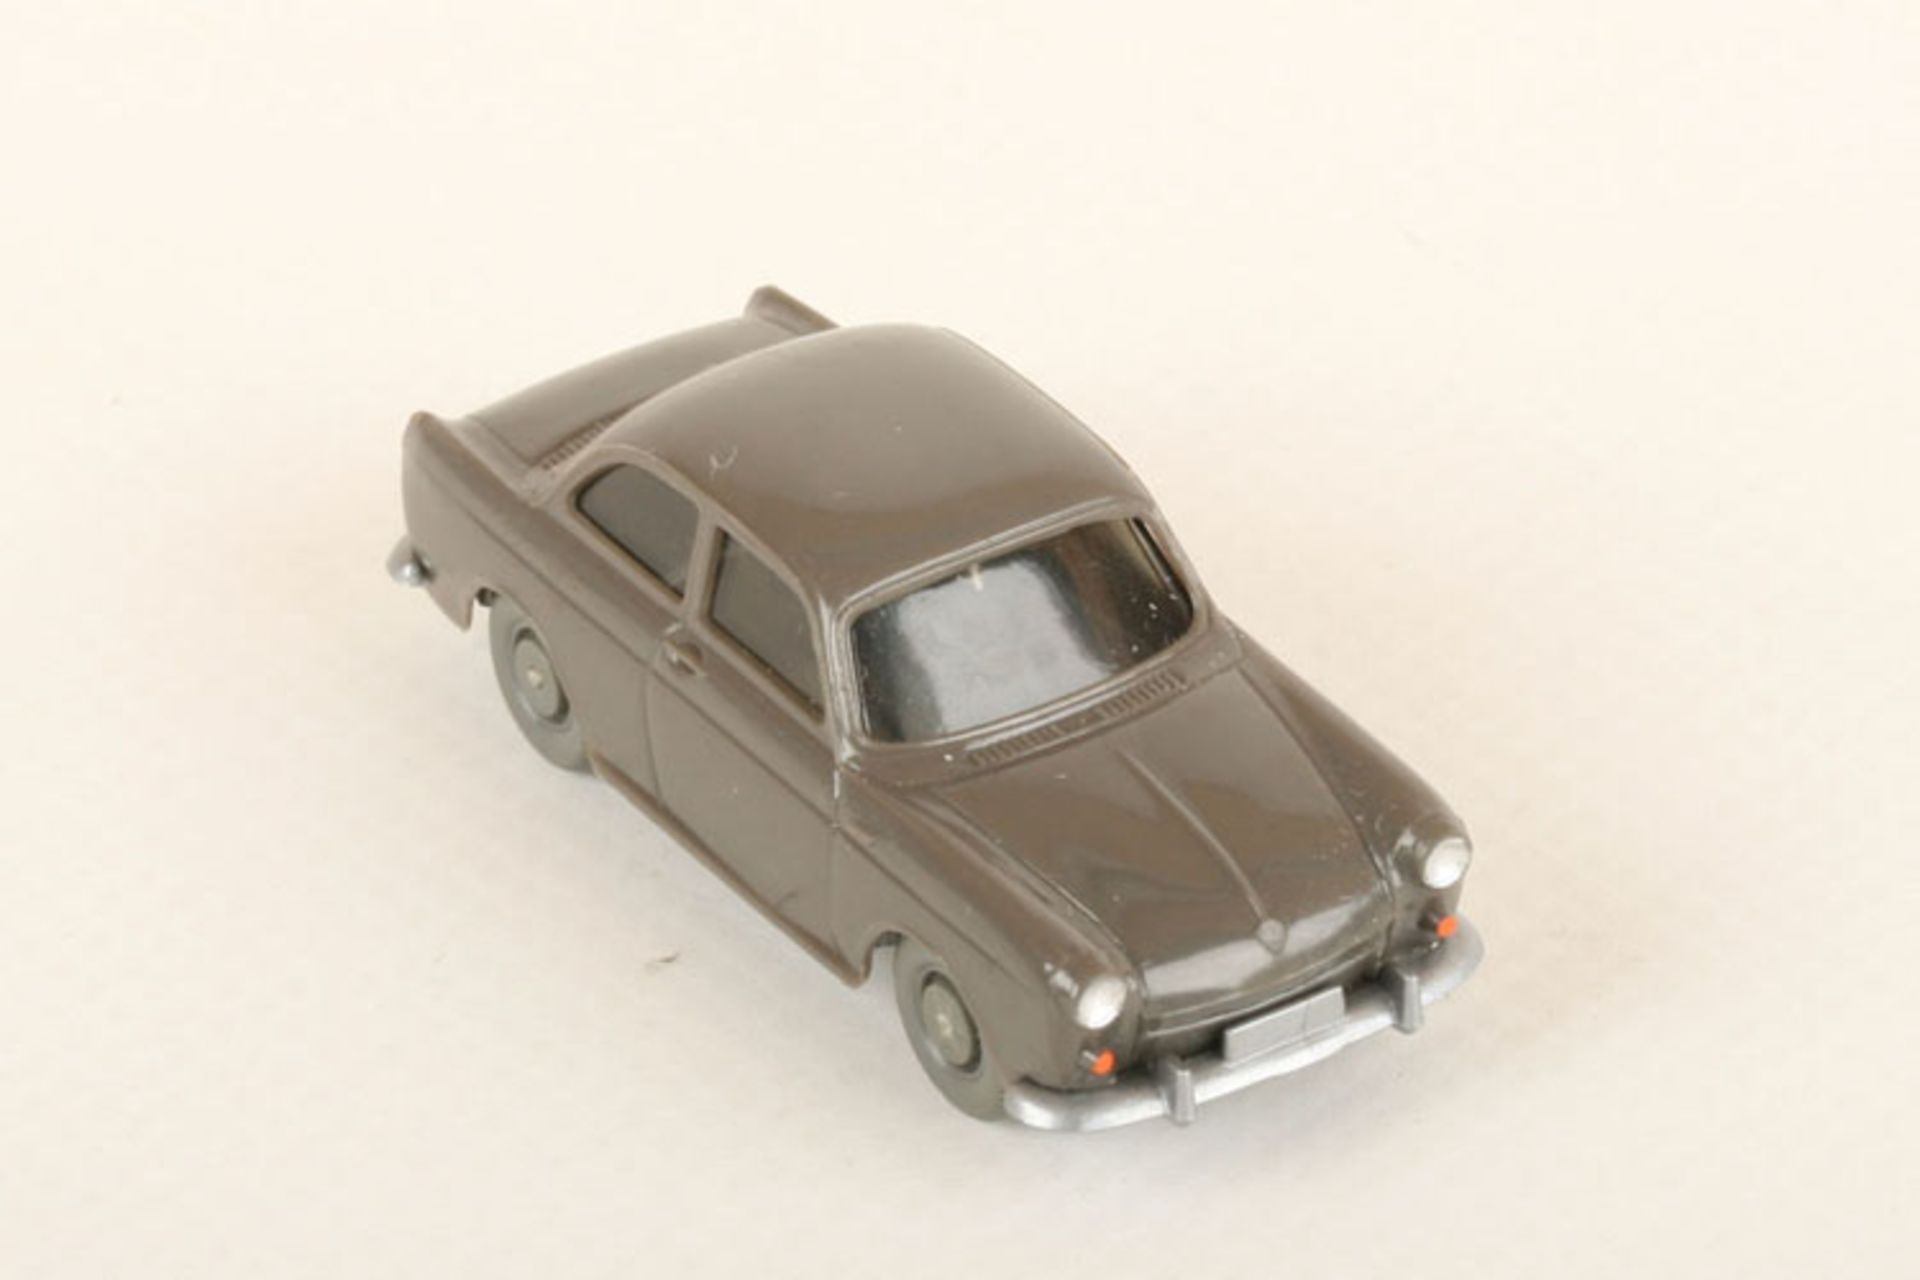 Los 1046 - Wiking VW 1500 umbragrau 40/12g, neuwertig